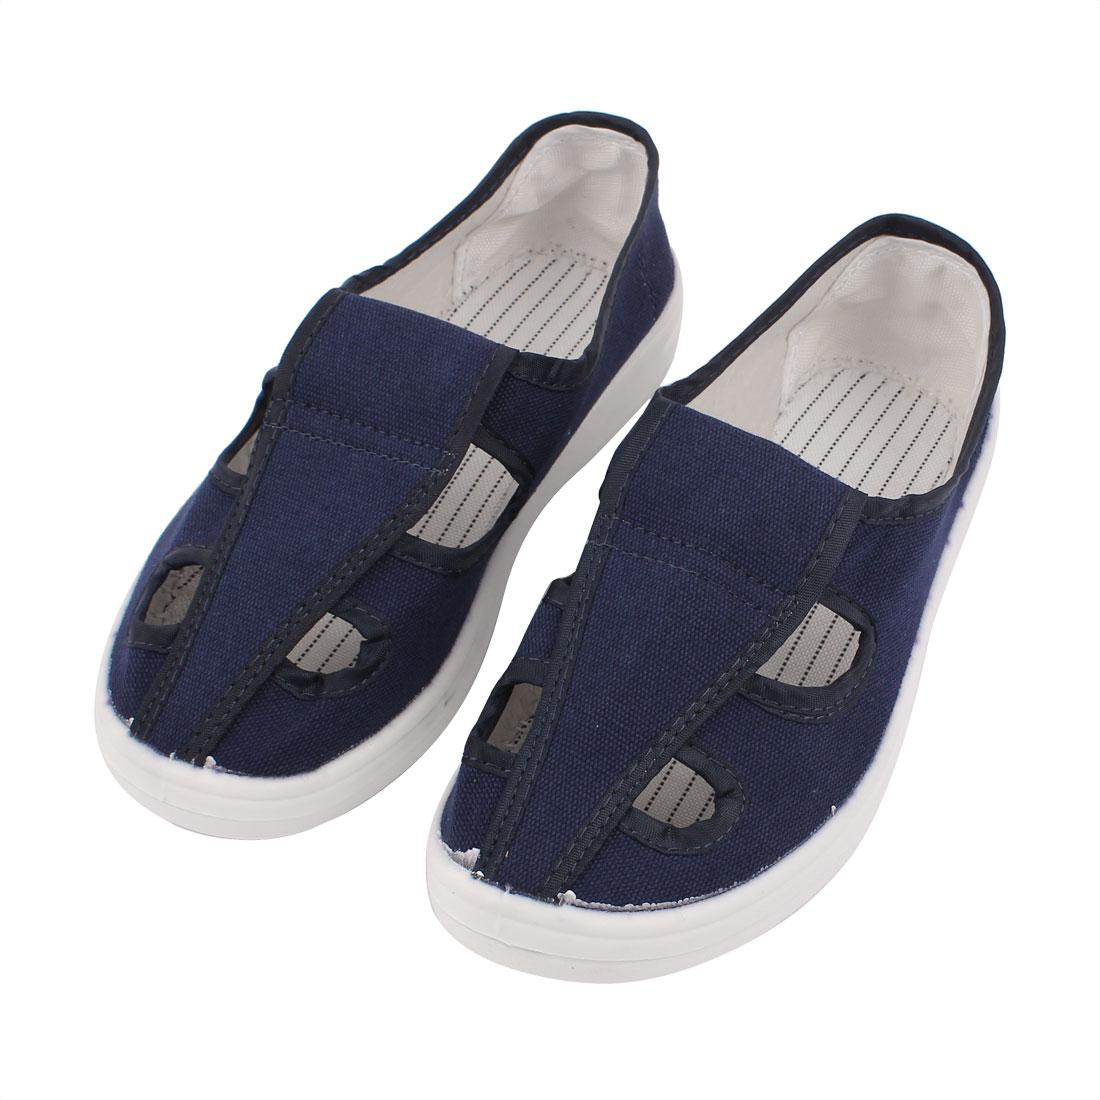 US8 UK7.5 EU41 PU Soft Bottom Nonslip Flat Sole Anti-static 4-Hole Canvas Shoes